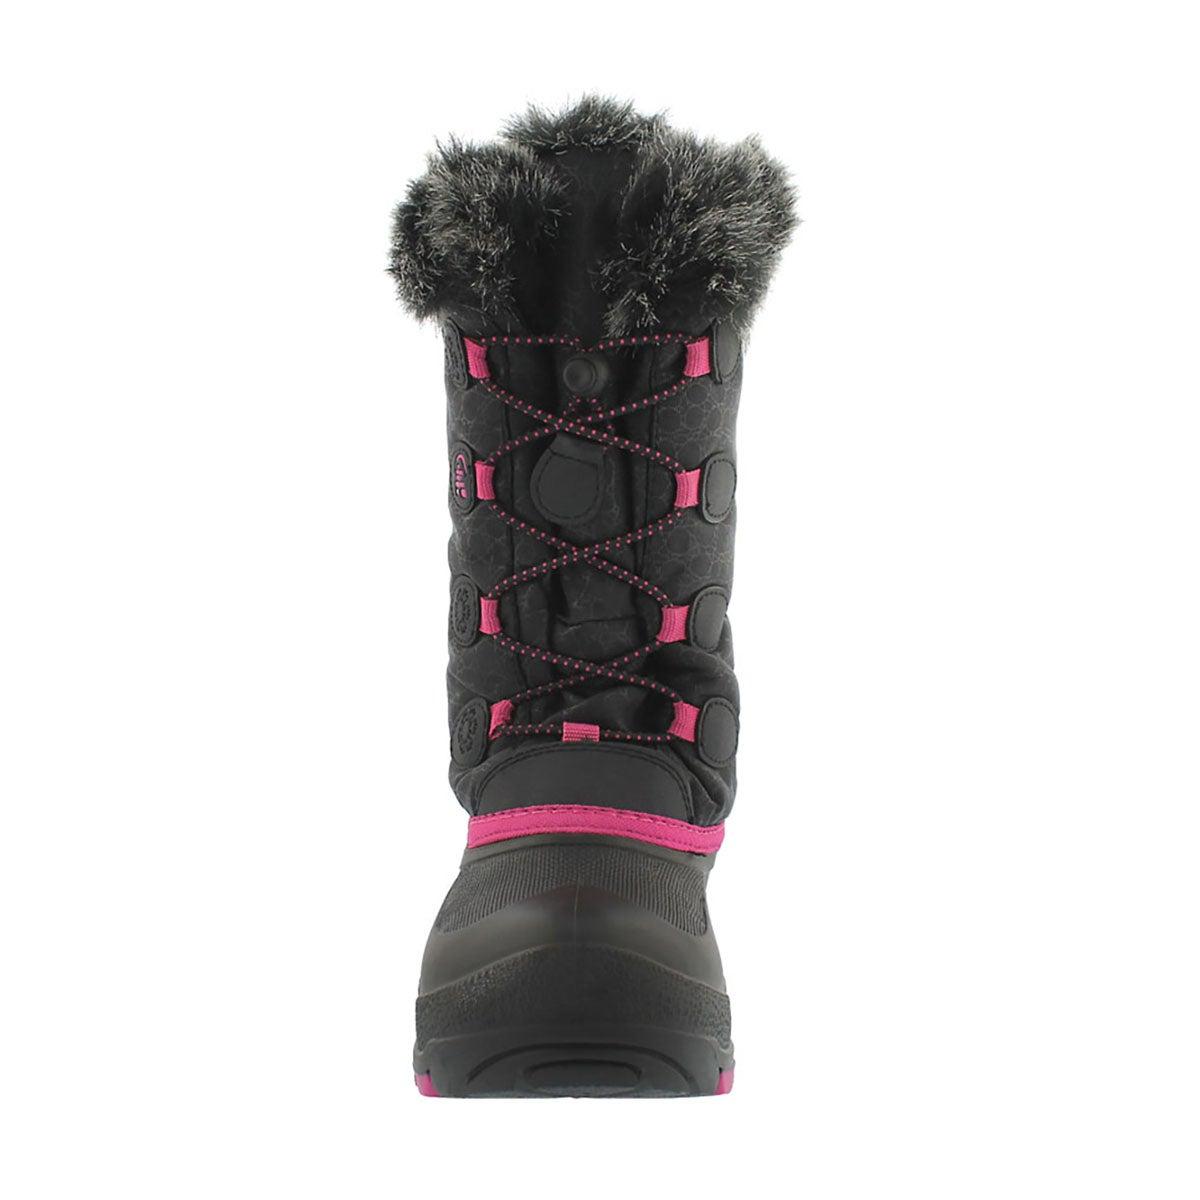 Grls Snowgypsy blk/mgnta winter boot